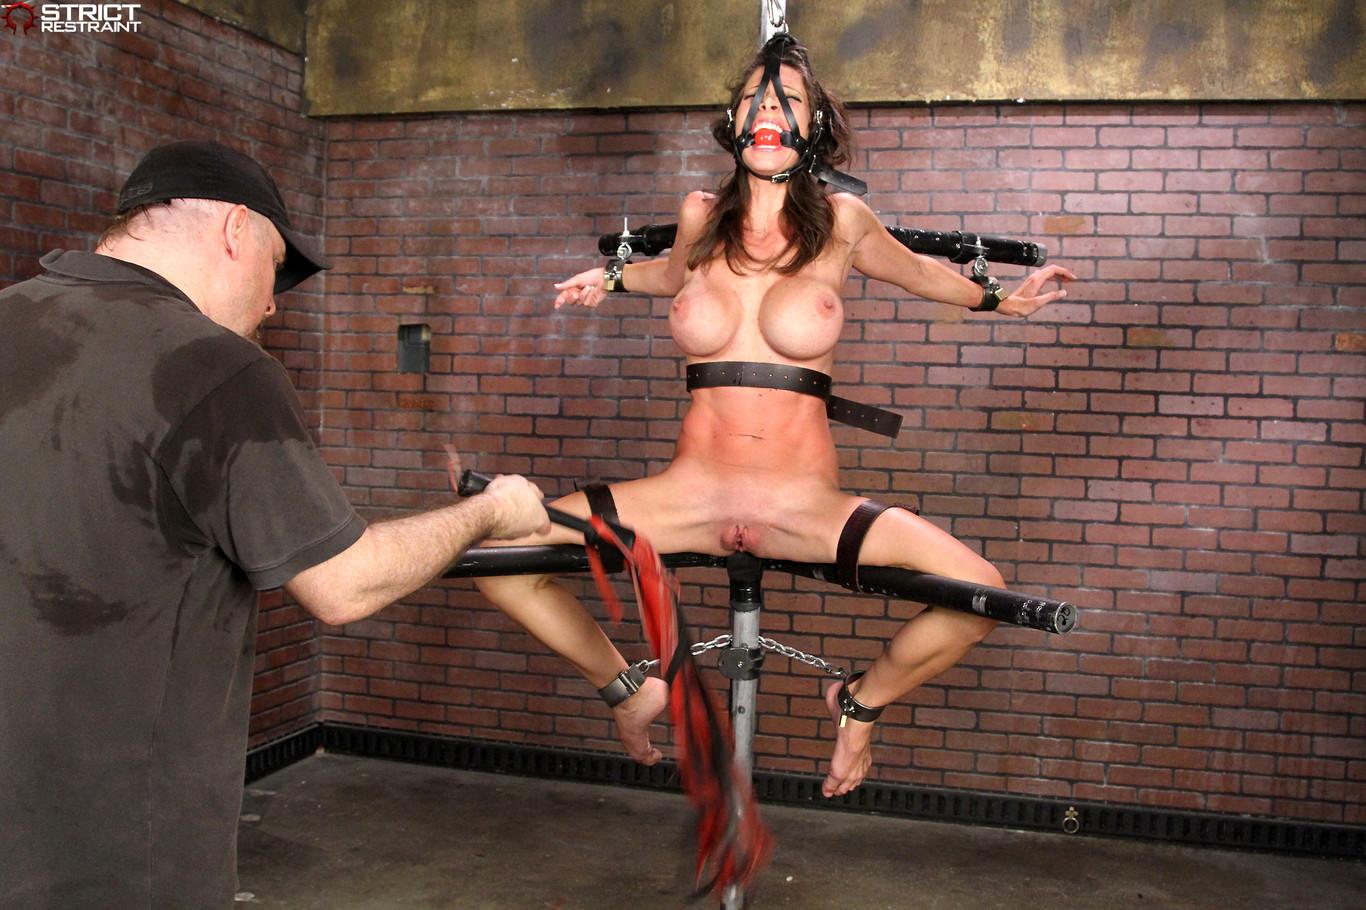 Best Bdsm Extreme Bondage Fetish Porn Sites